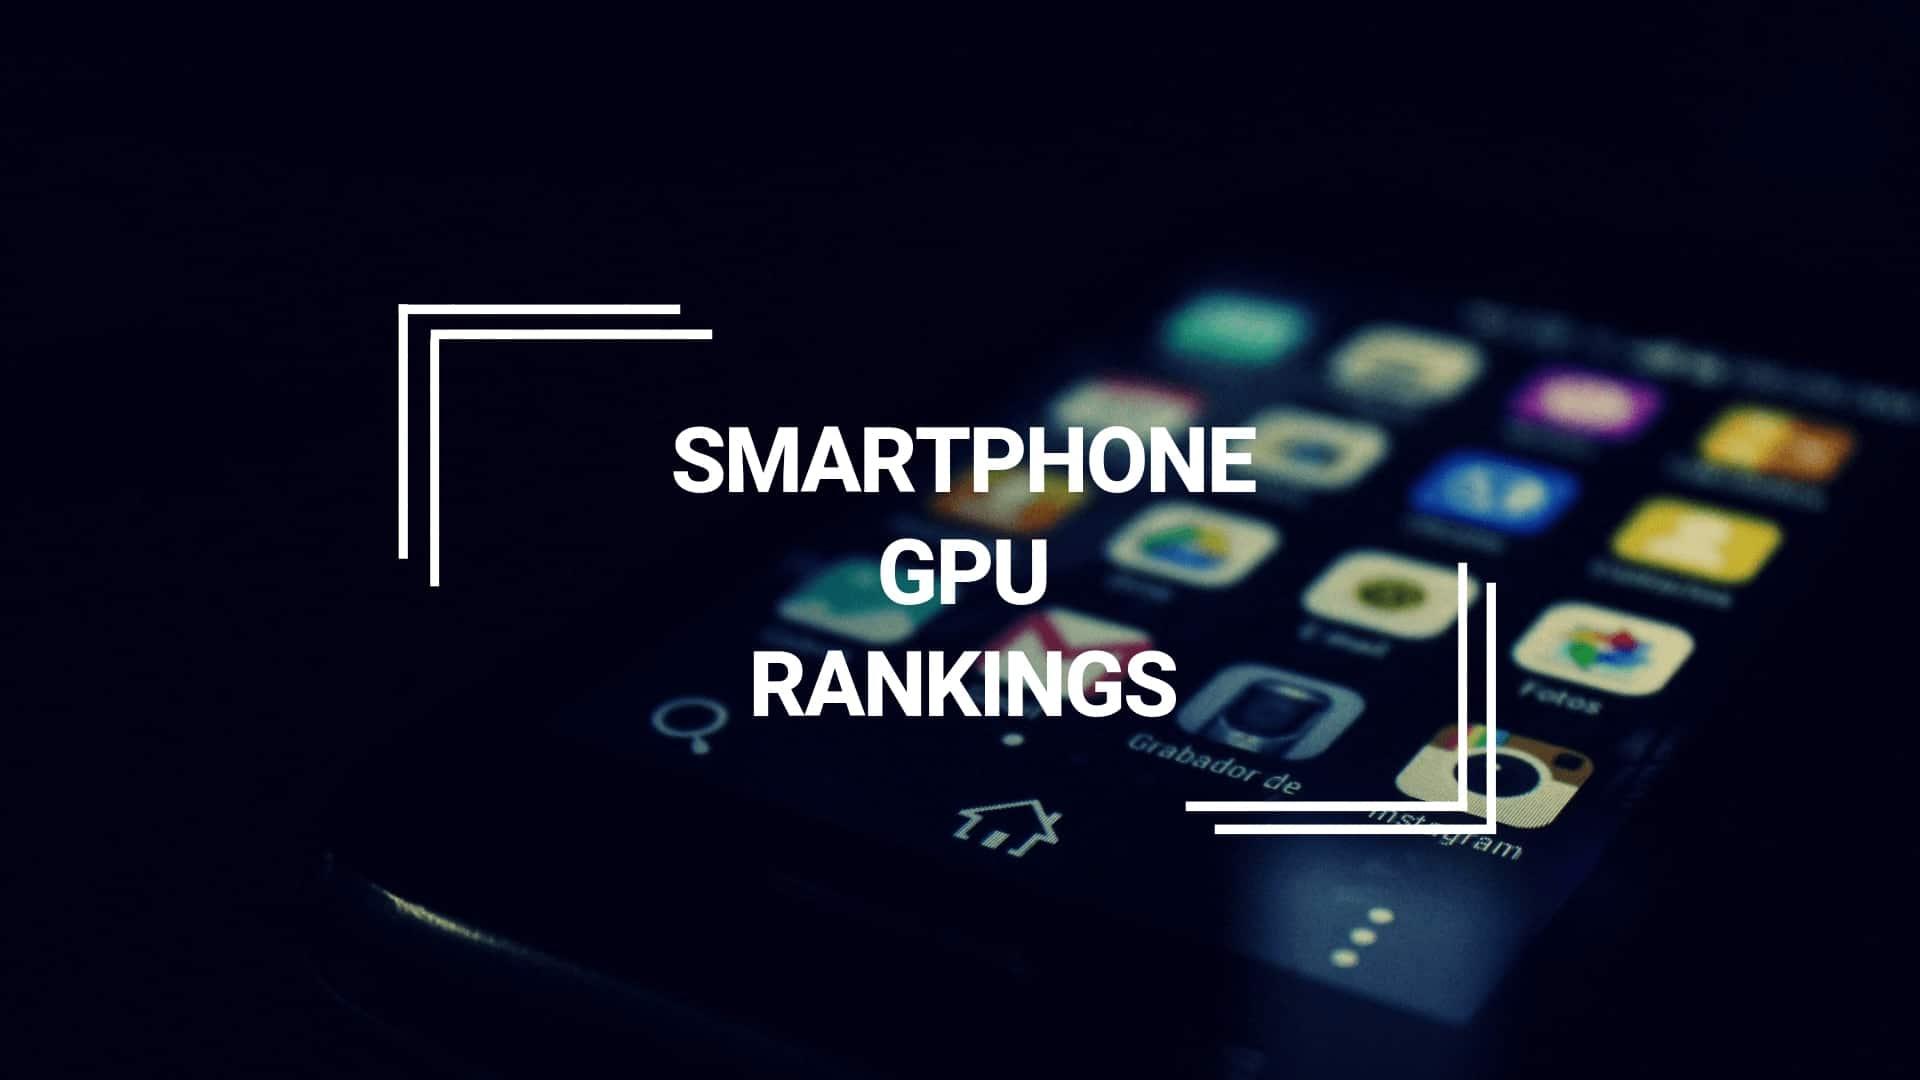 Mobile GPU Rankings 2019 (Adreno/Mali/PowerVR) - Tech Centurion